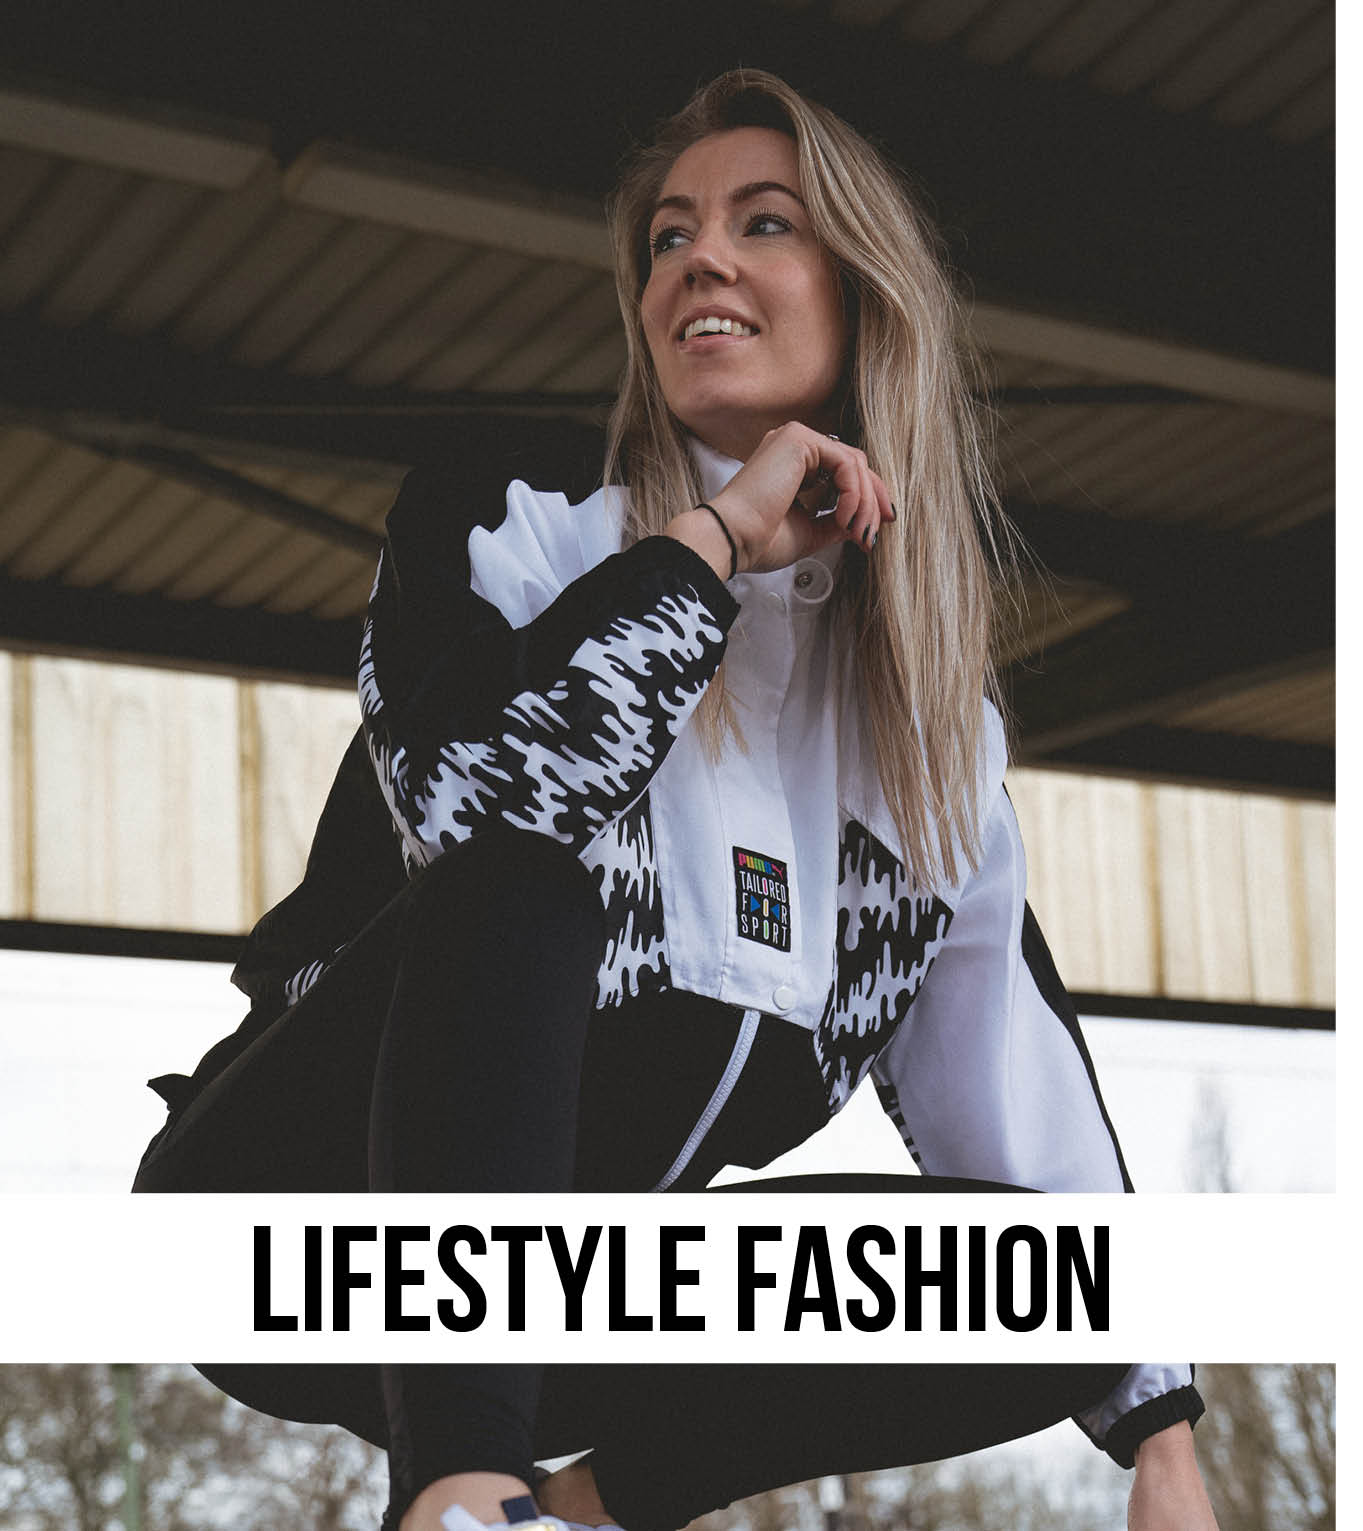 Lifestyle Fashion